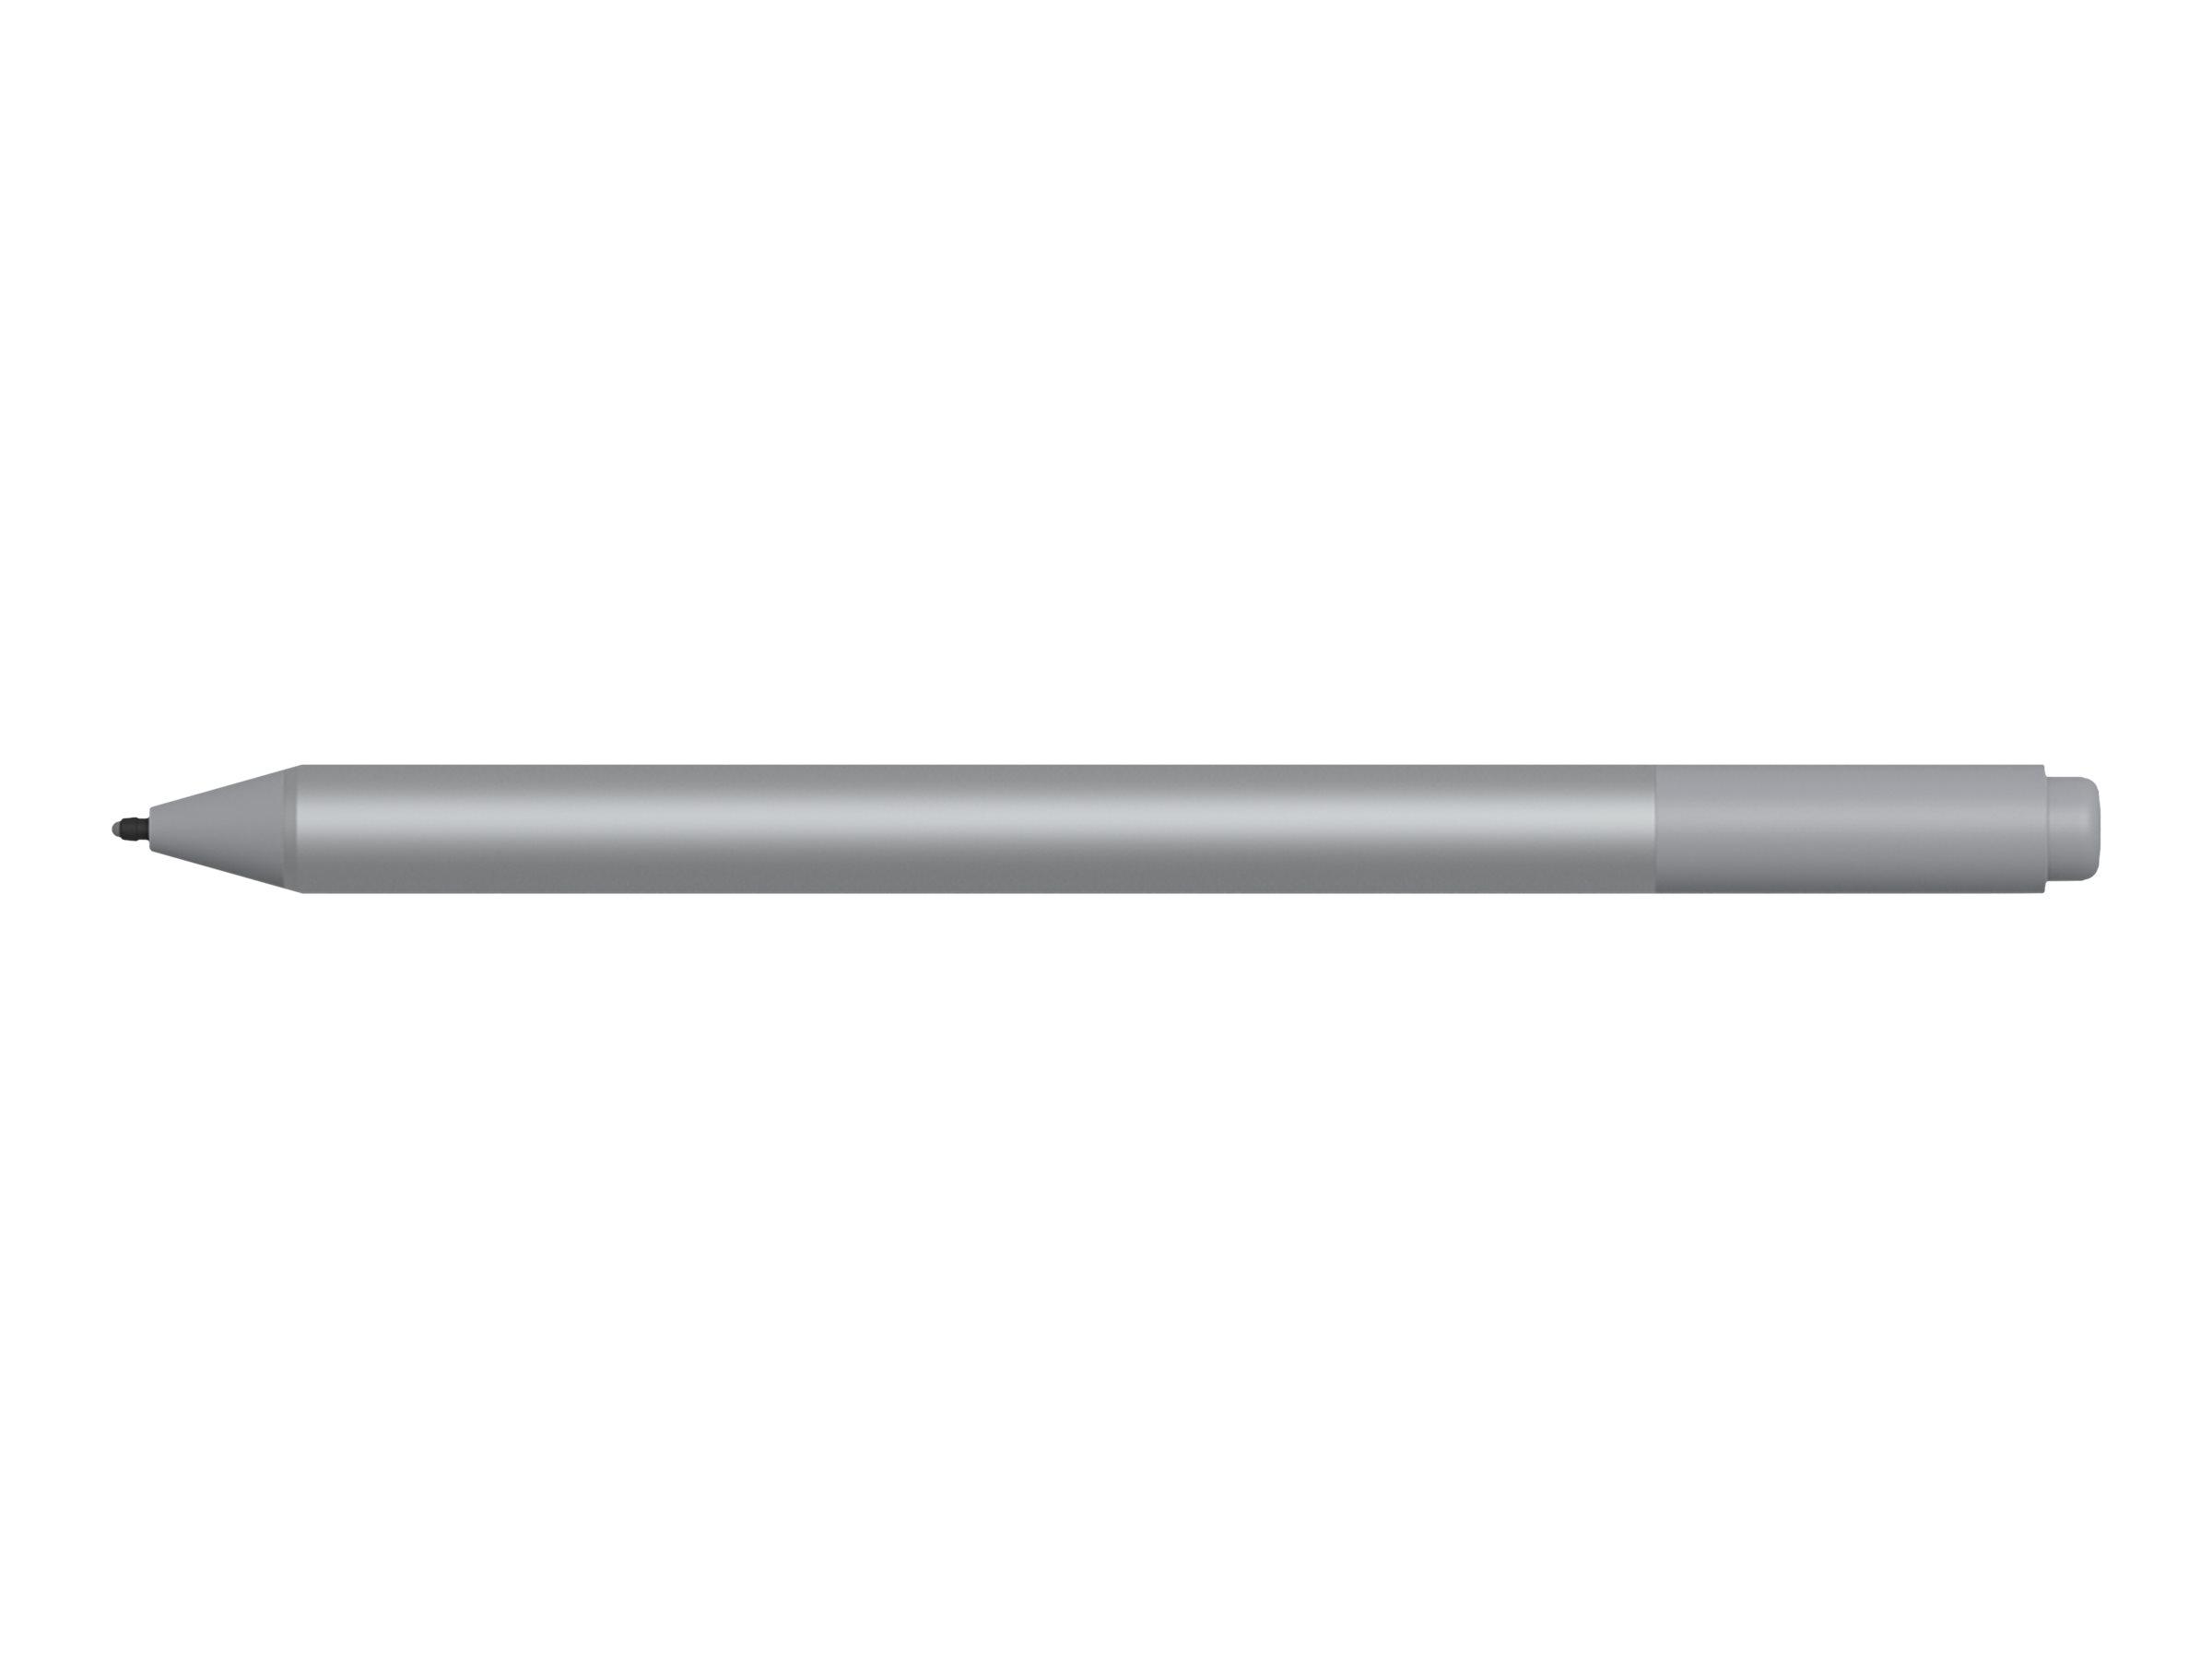 Microsoft Surface Pen M1776 - Stift - 2 Tasten - kabellos - Bluetooth 4.0 - Platin